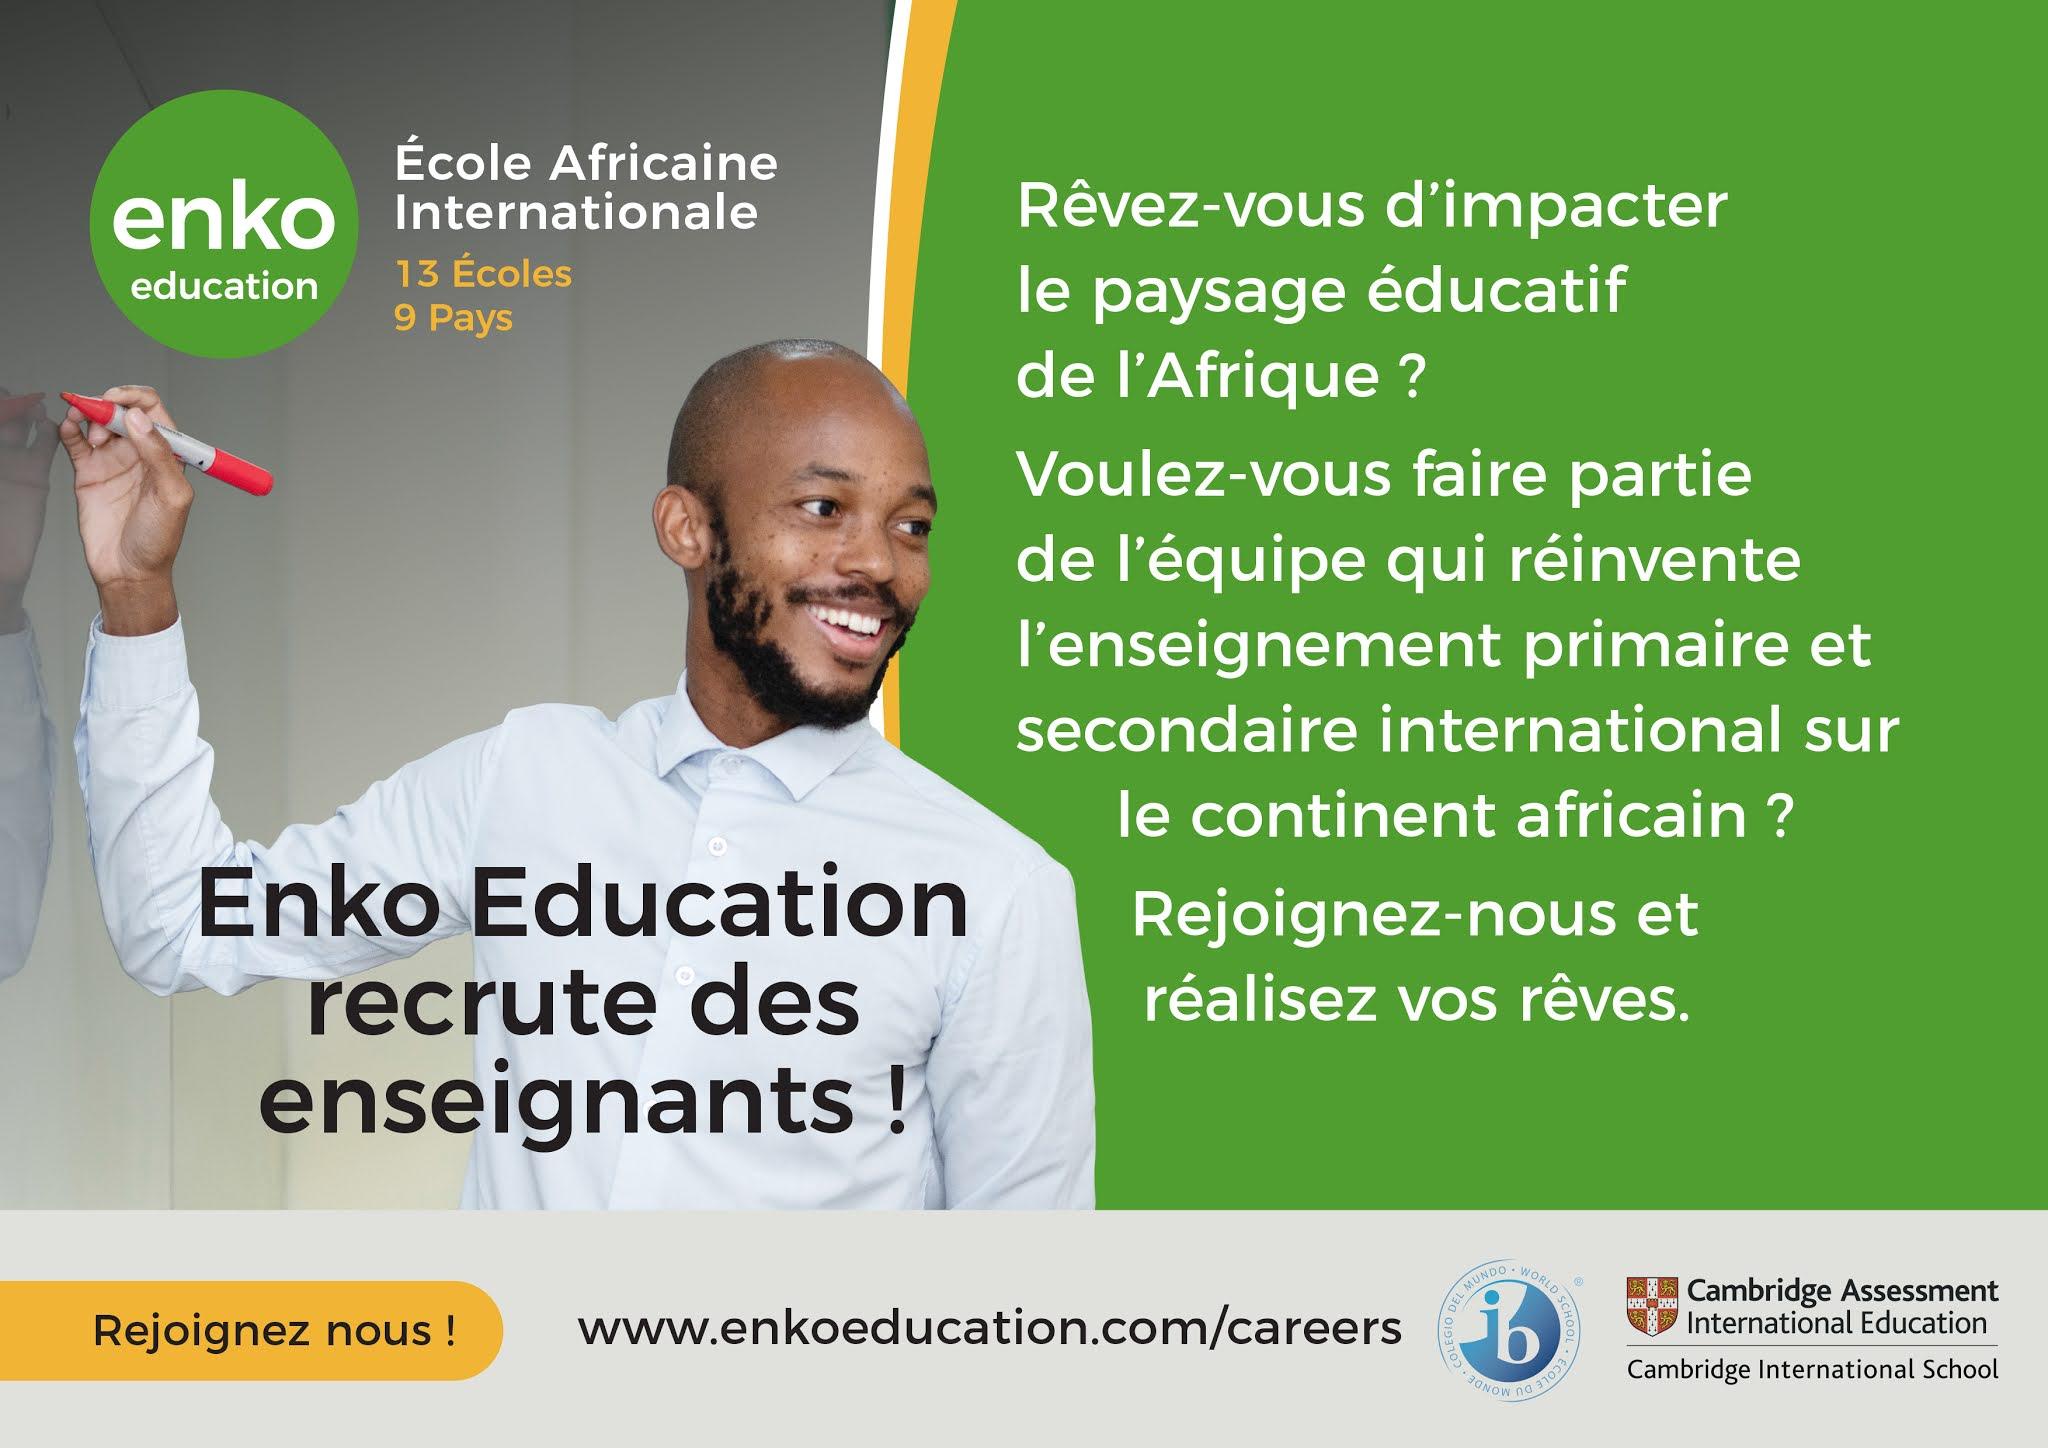 Enko Education recrute 60 Enseignants